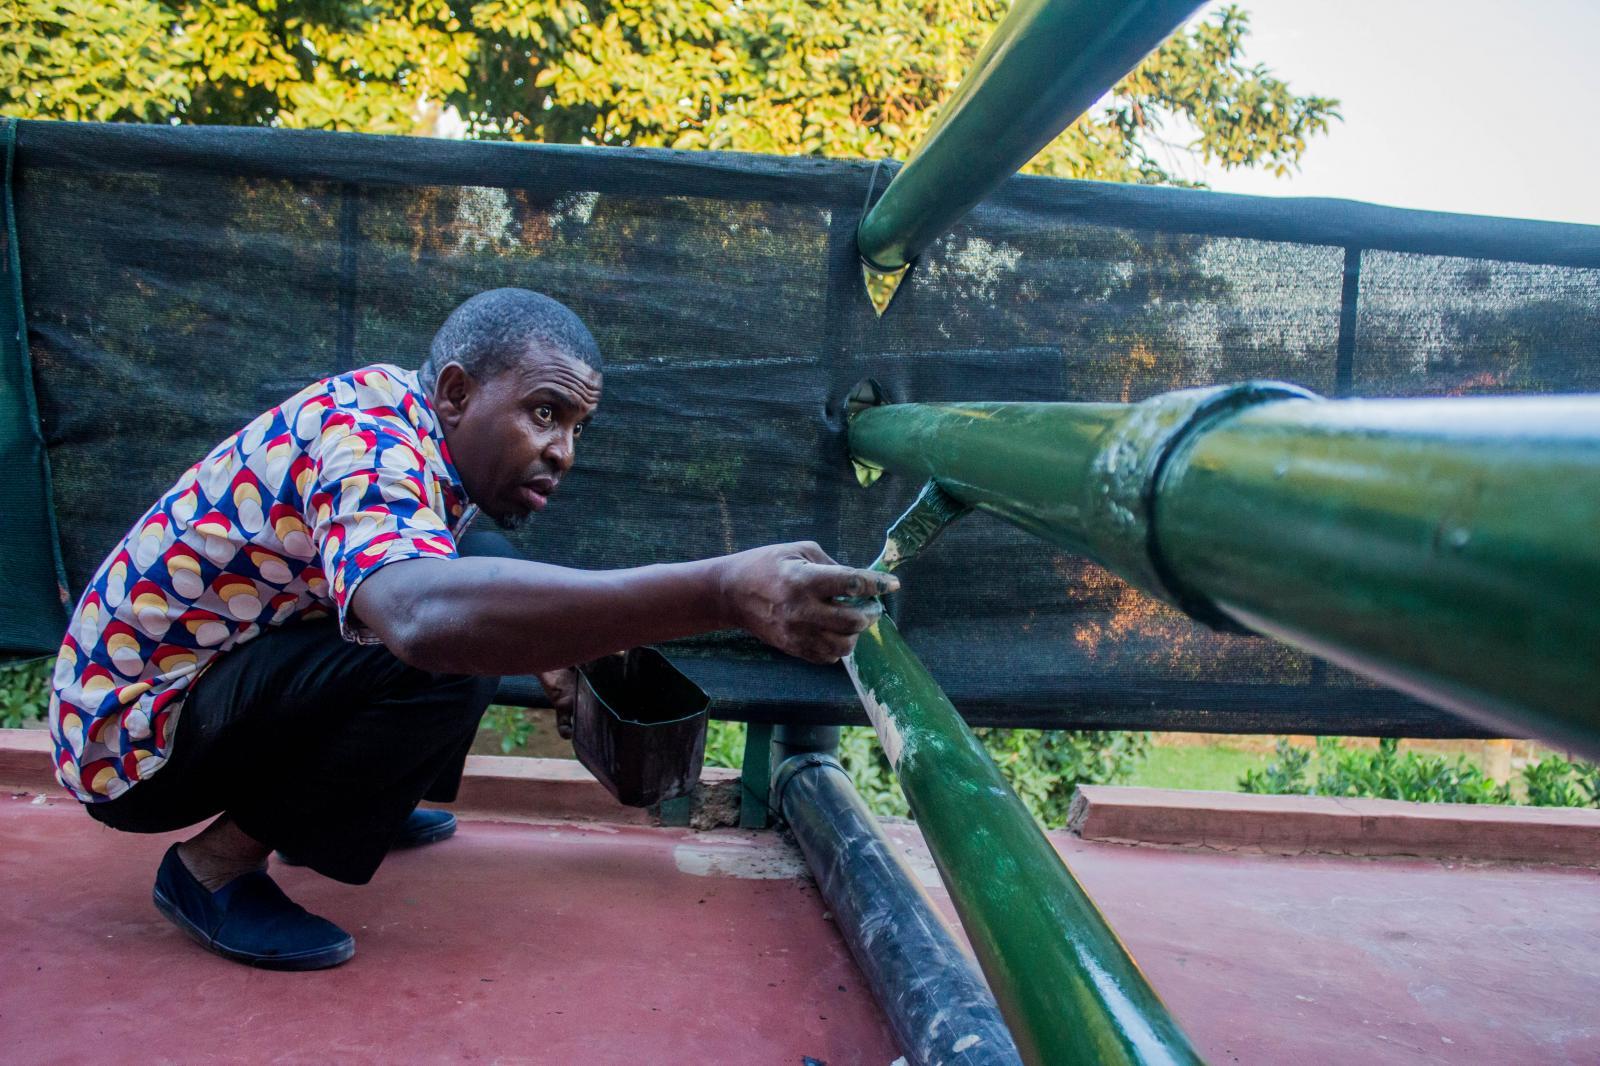 Photography image - Loading Budget_Lodgers__Kigali__Rwanda-1.JPG